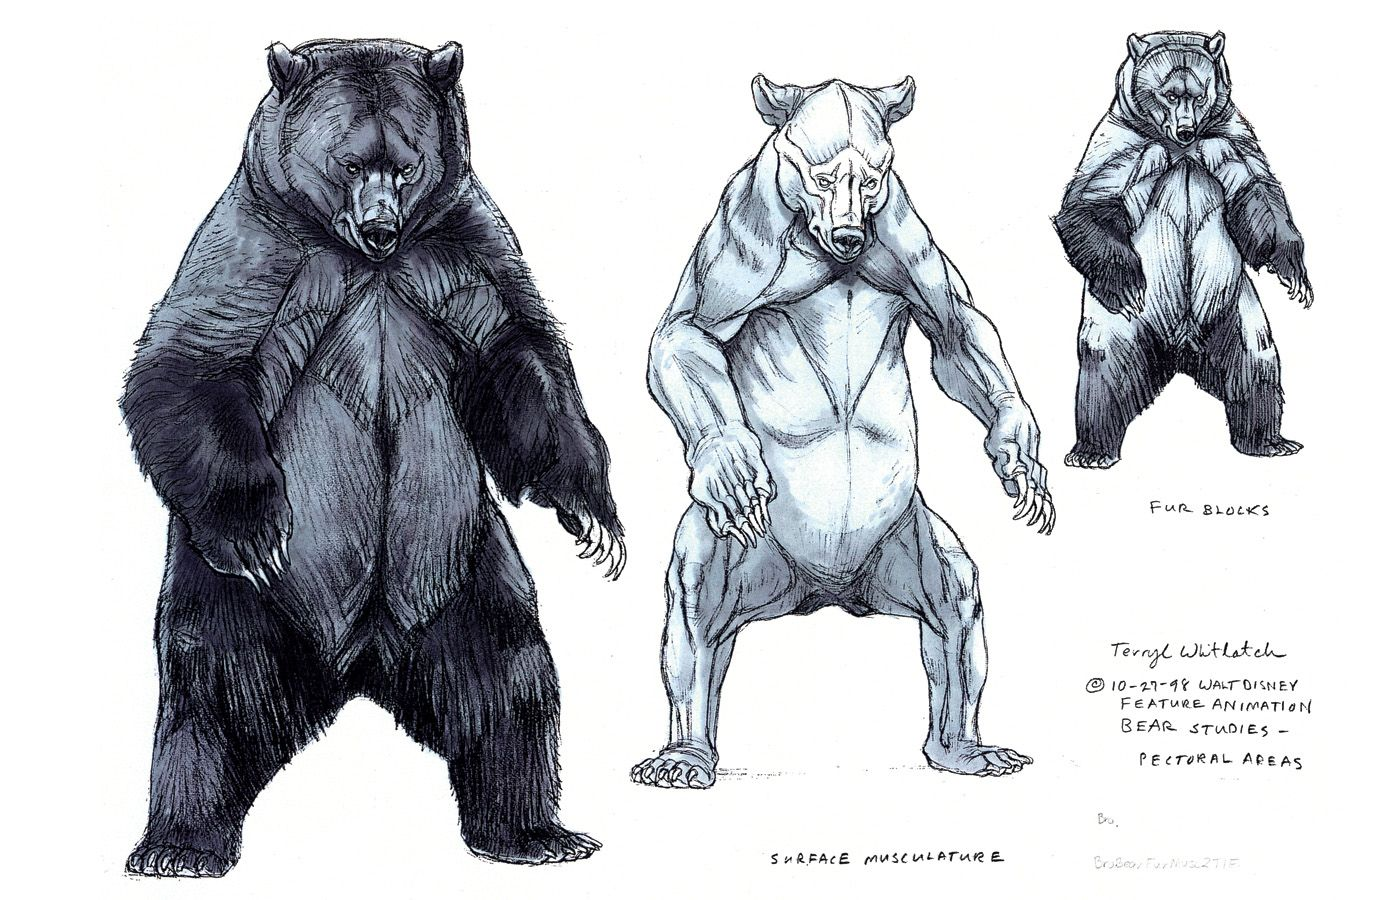 Bear by Terryl Whitlatch | Terryl whitlatch | Pinterest | Bears ...